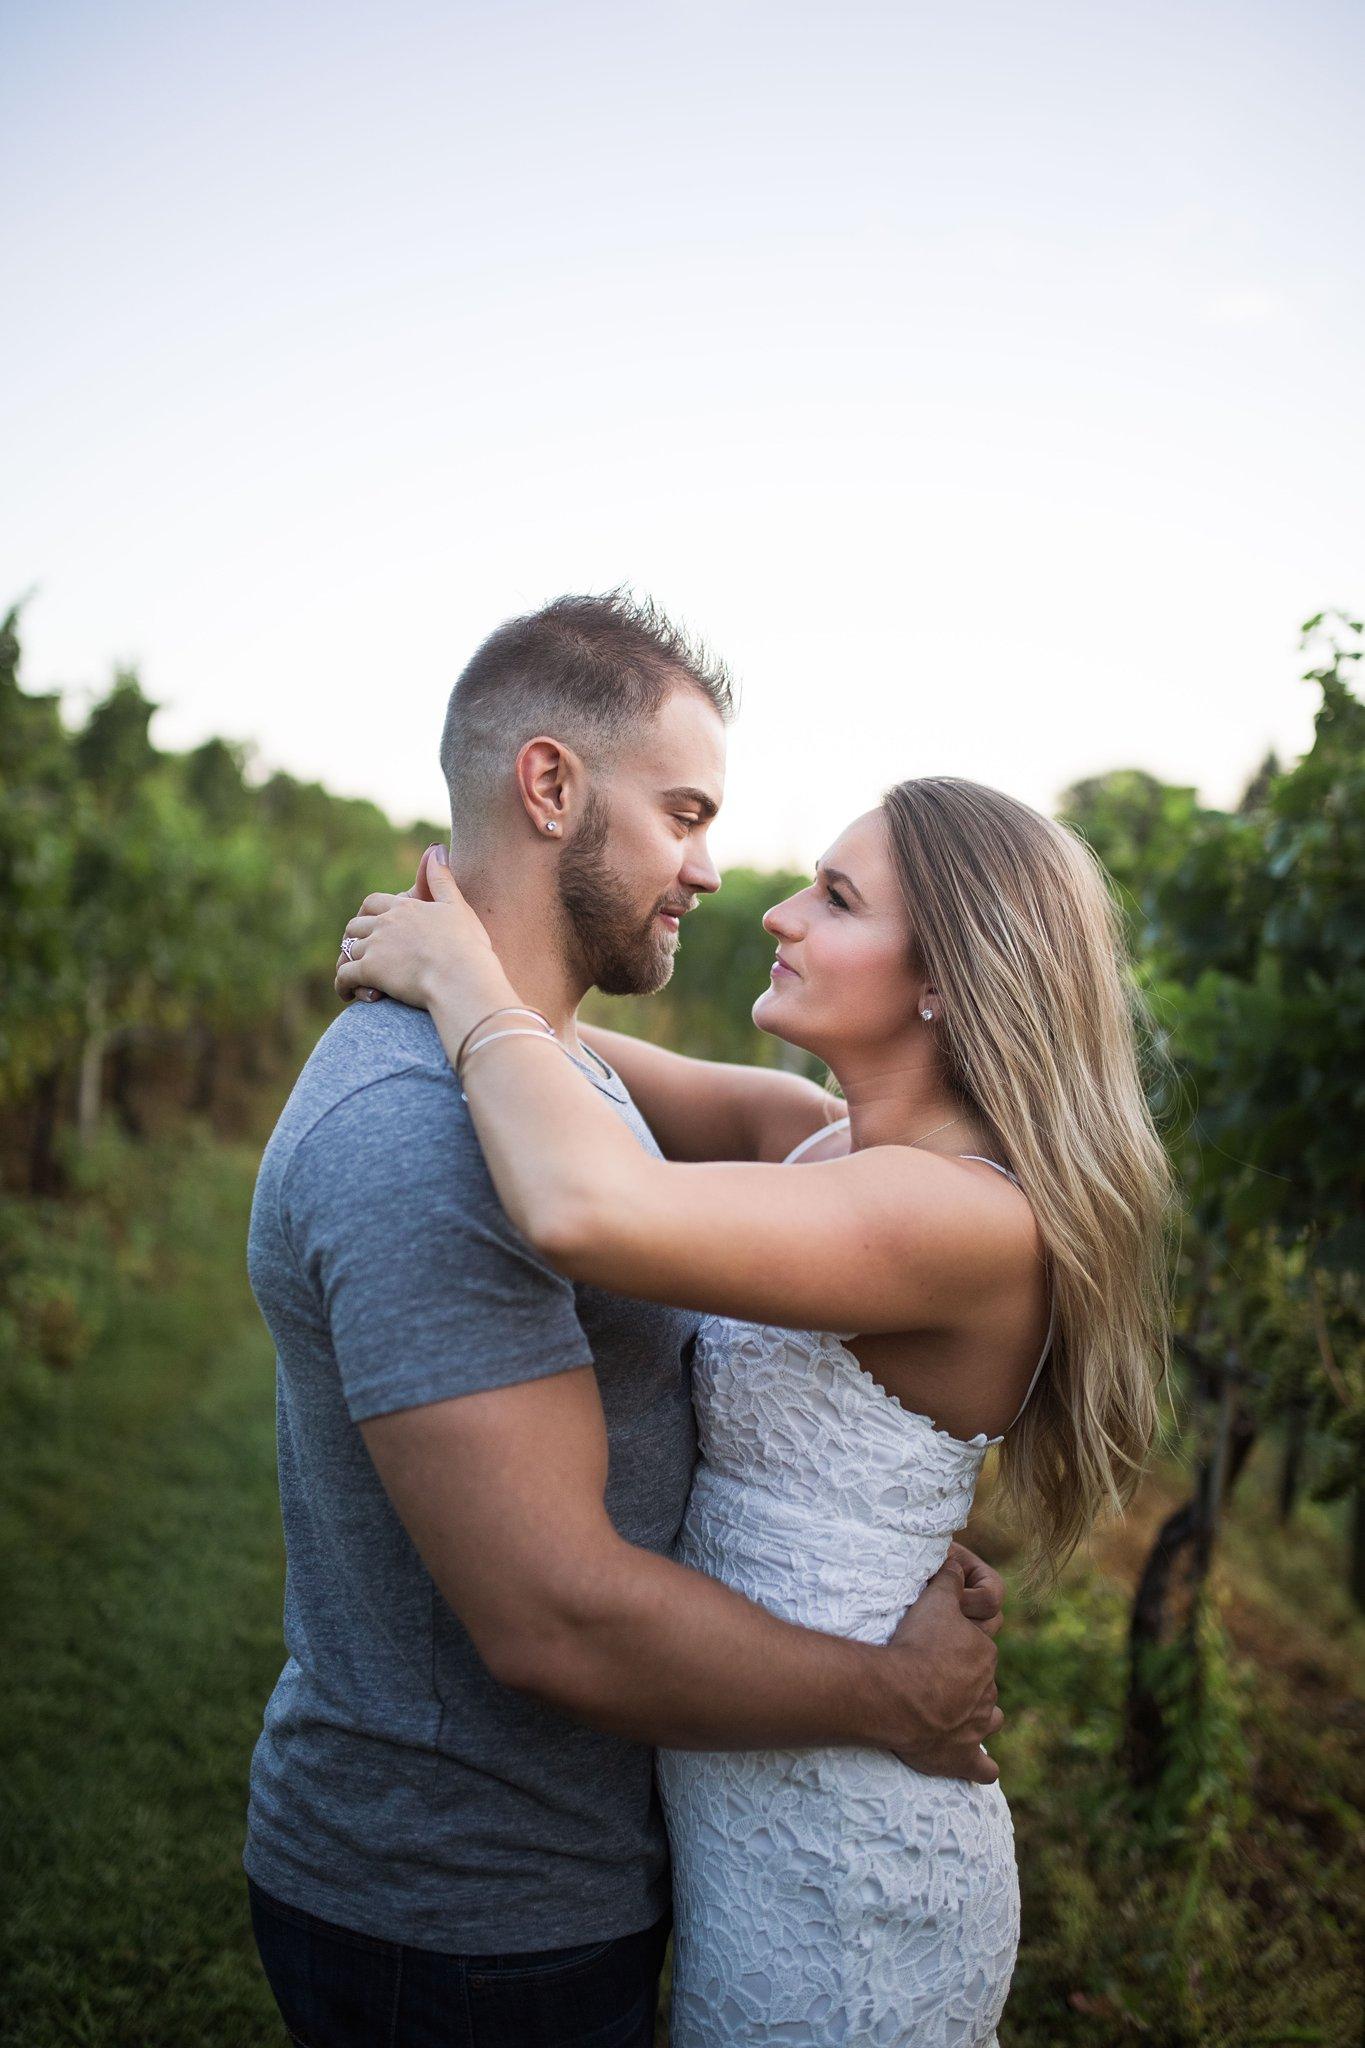 Lehigh Valley dating